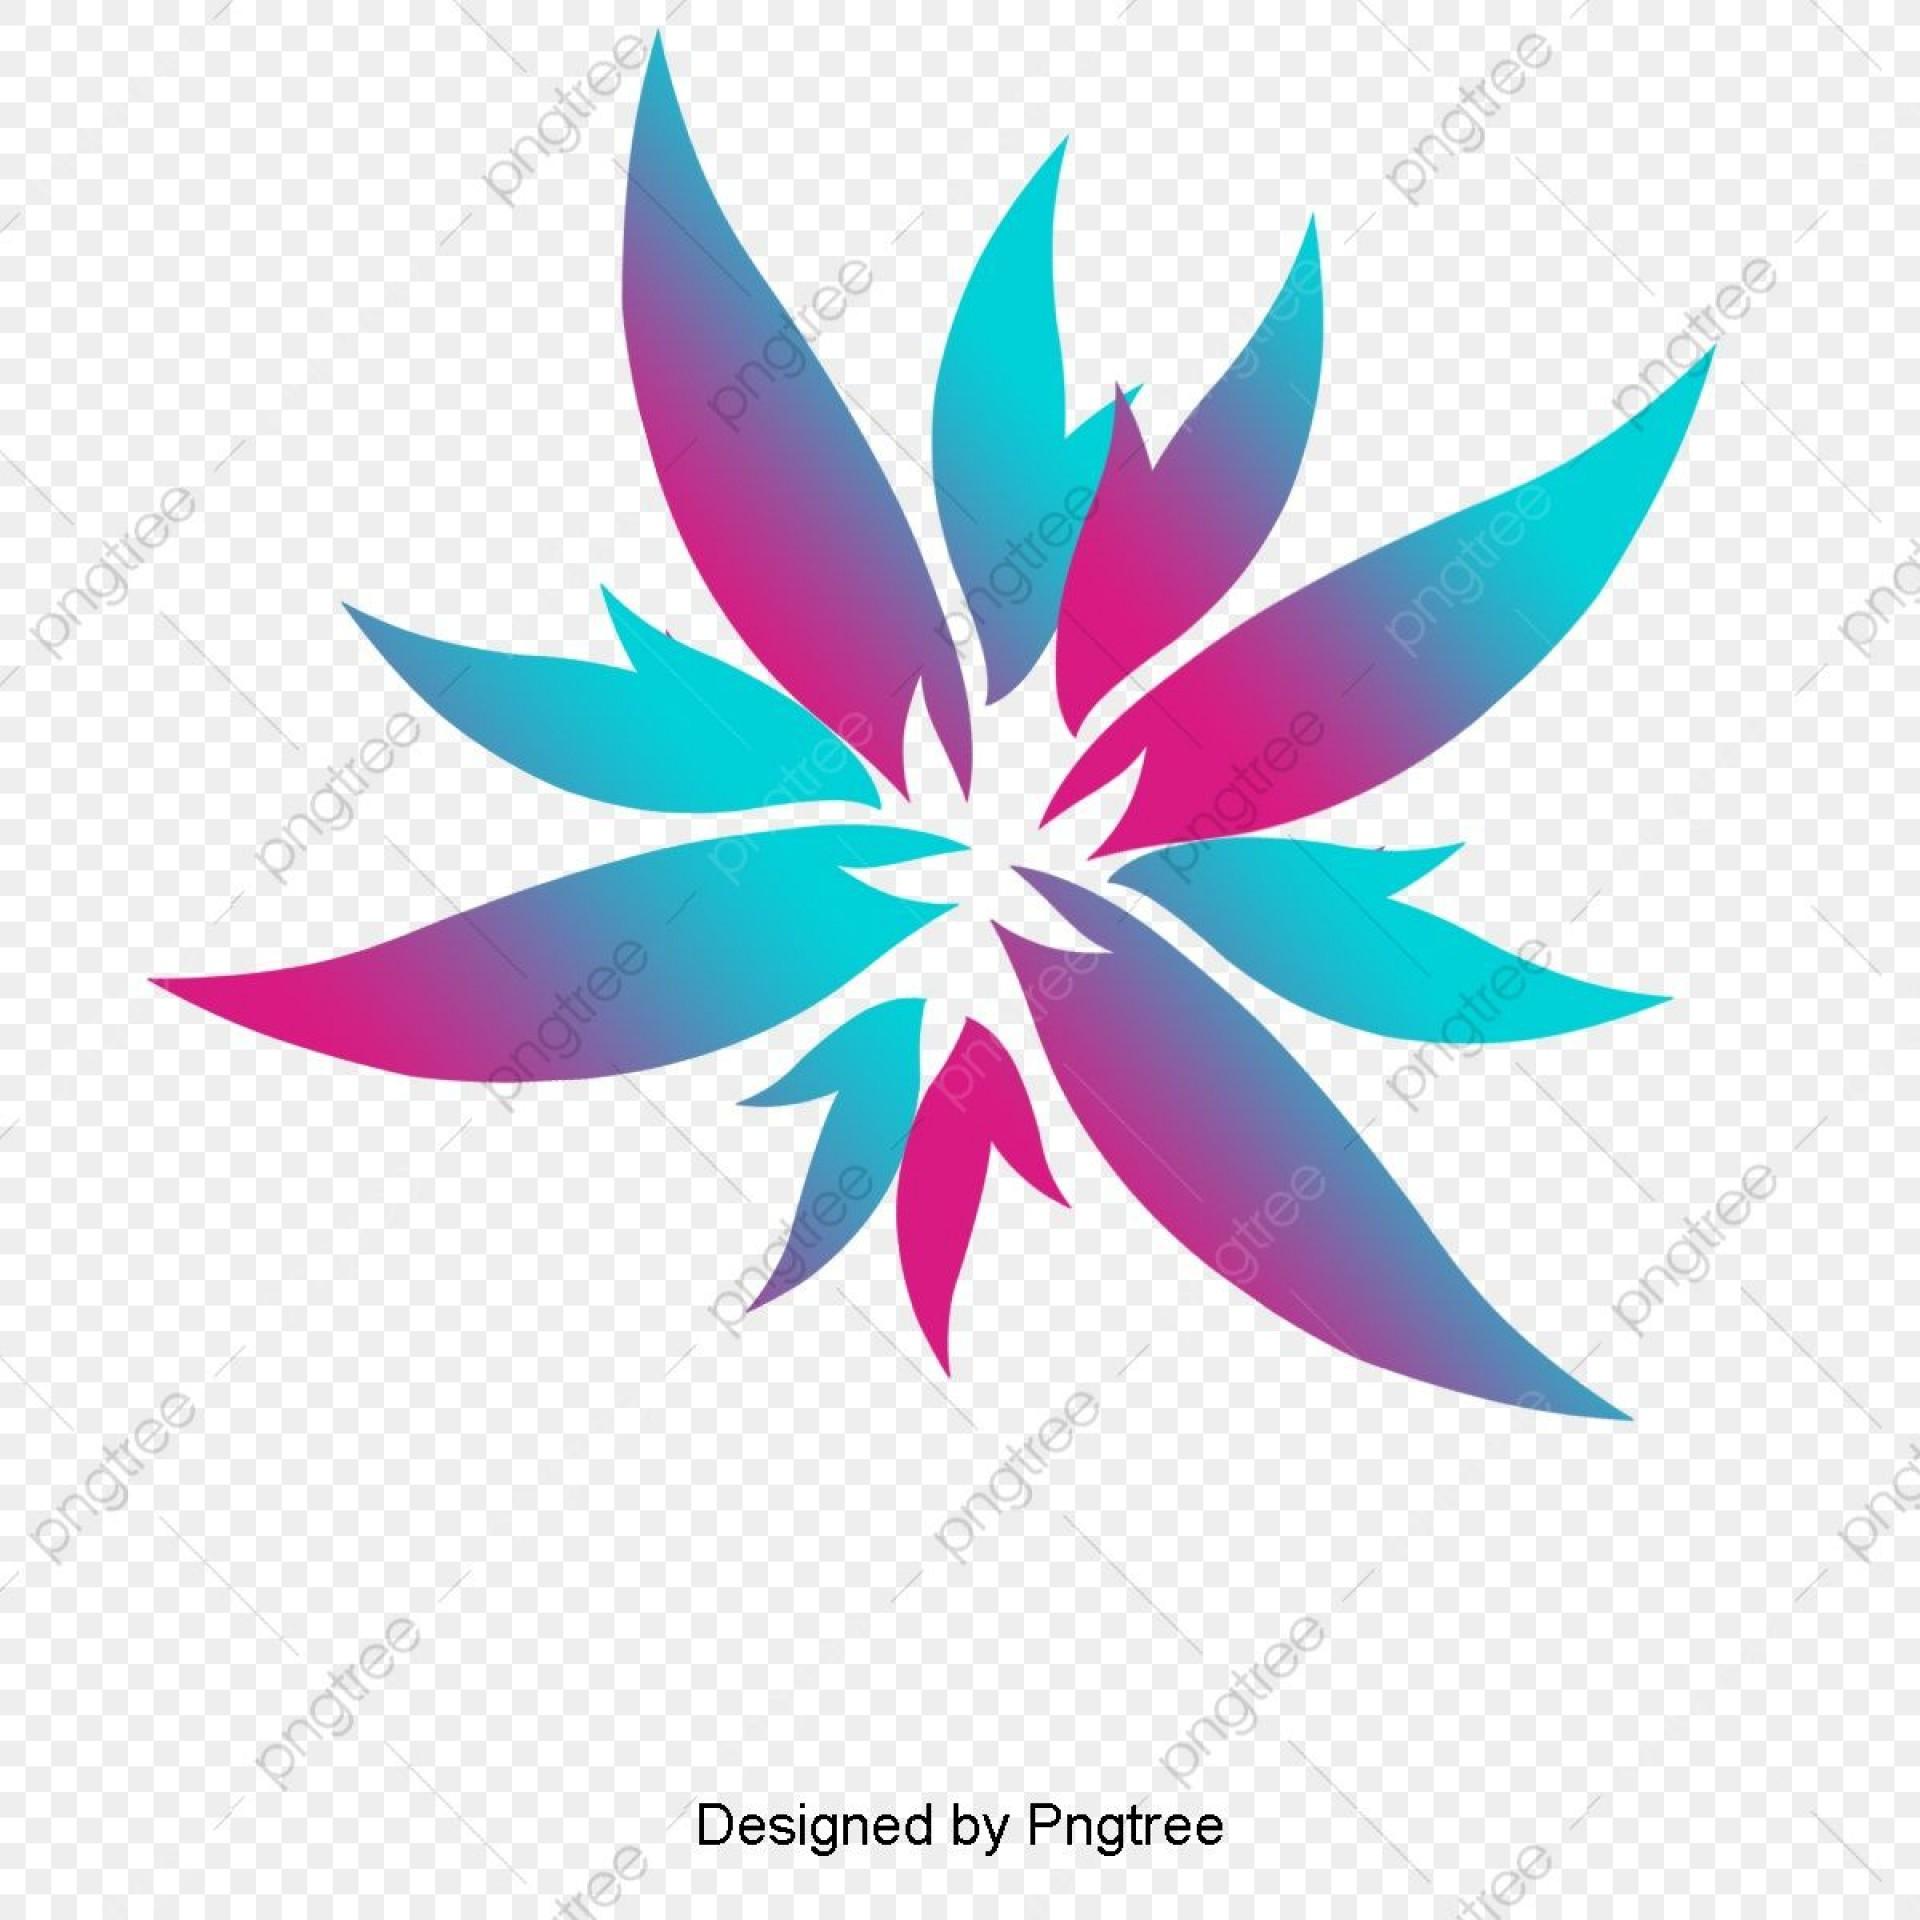 009 Sensational Free Busines Logo Template High Def  Templates Design Download Powerpoint1920